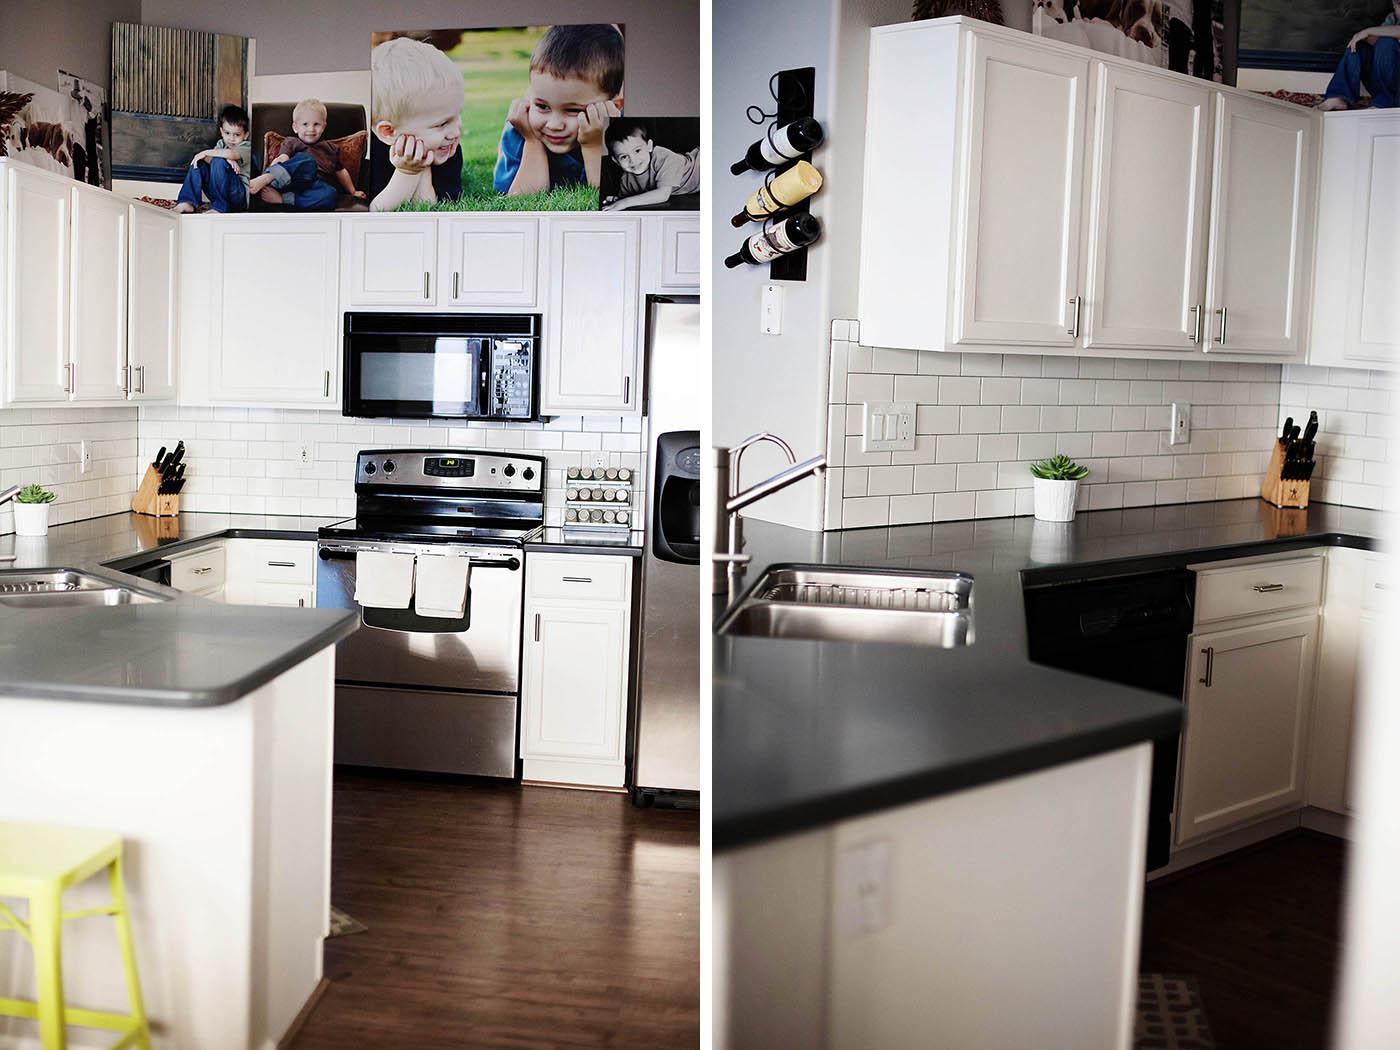 Kitchen renovation with Moen